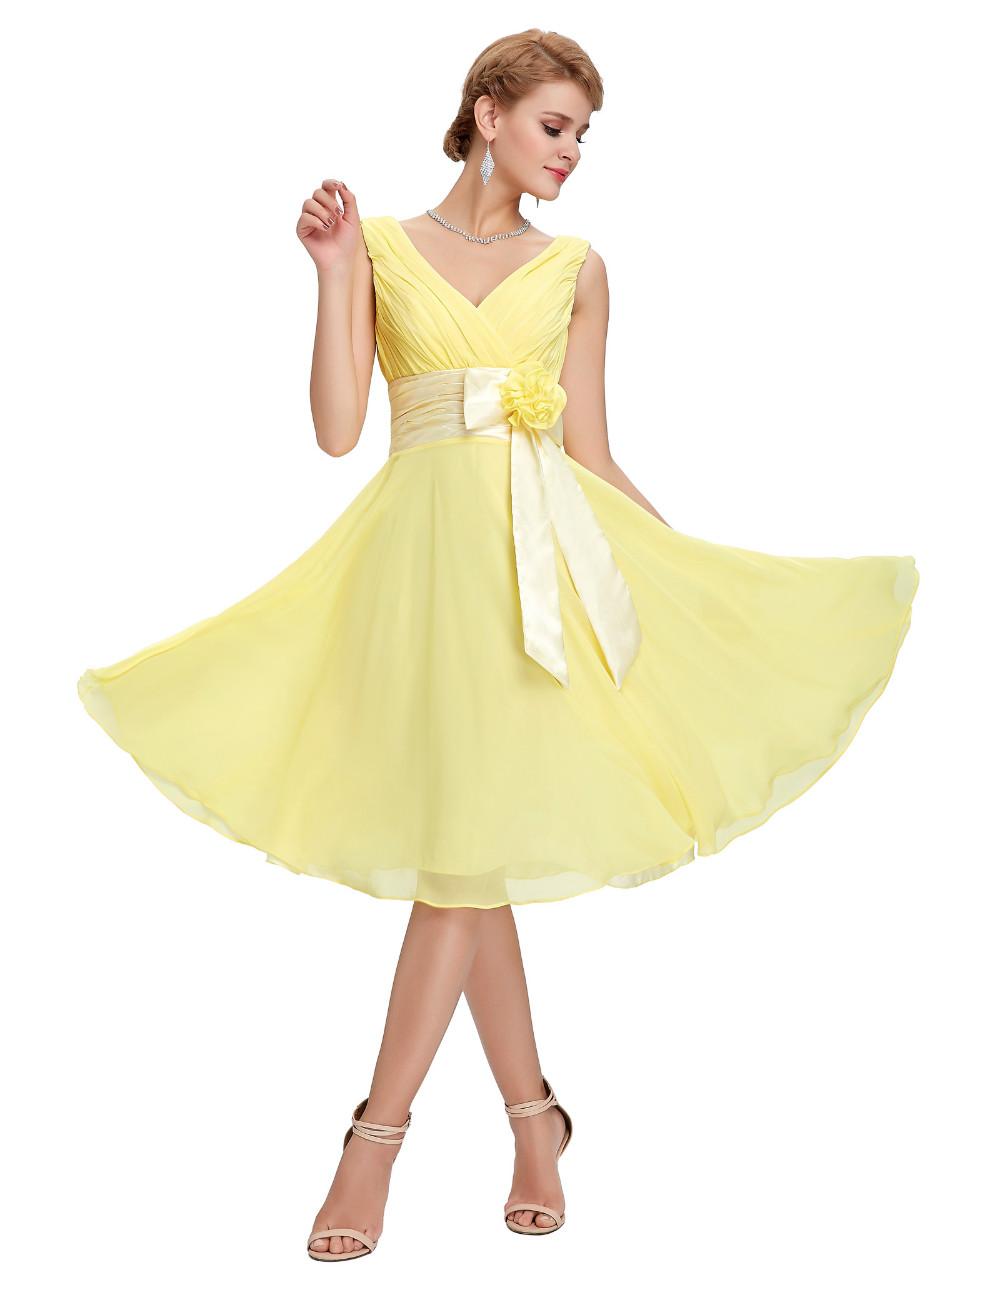 HTB1SA64MVXXXXavXpXXq6xXFXXXqKnee Length Short Chiffon Blue Dress